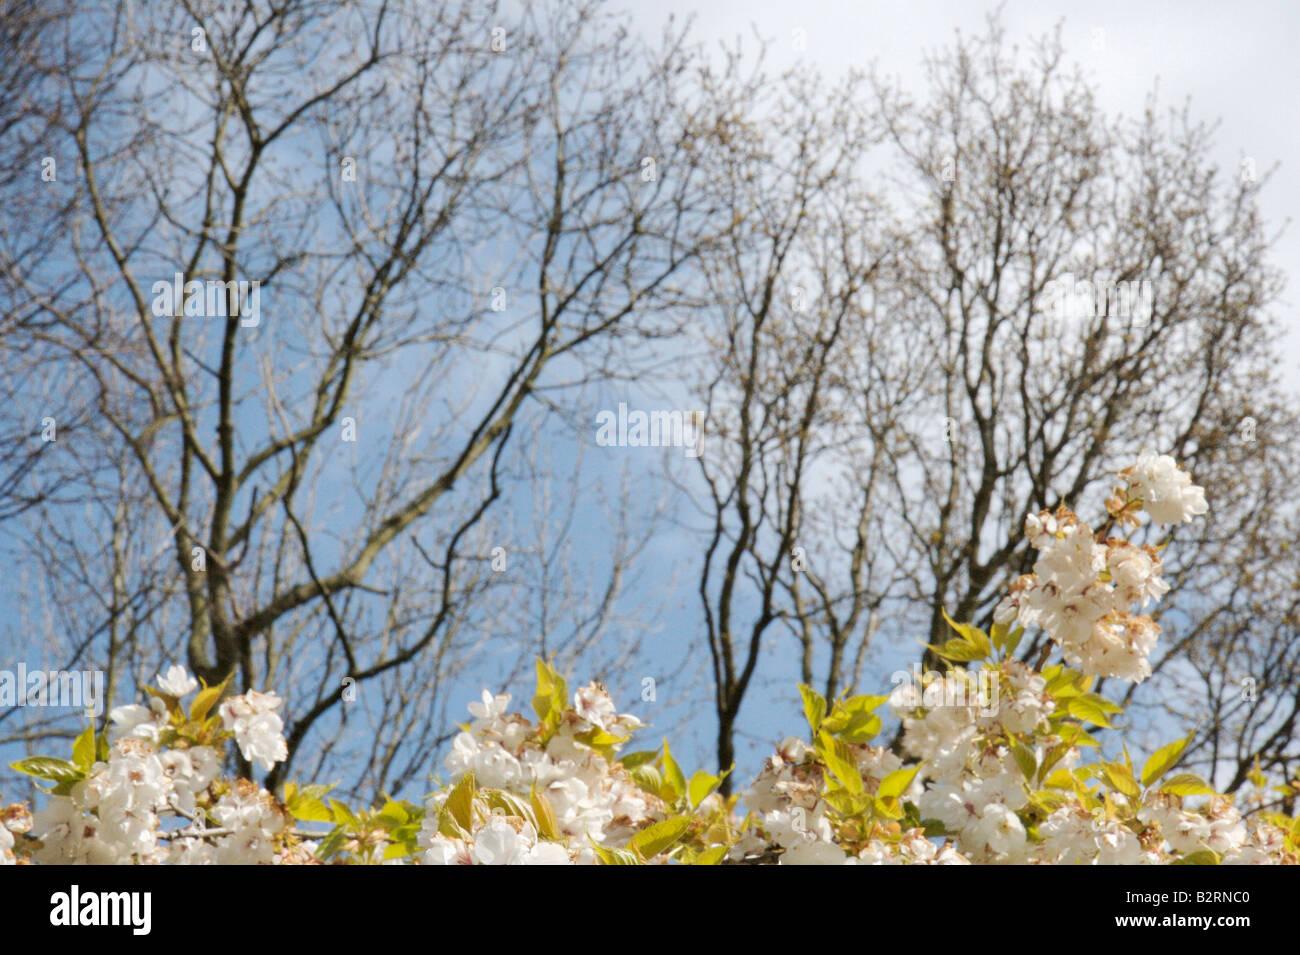 white flowering fruit tree in front of blue sky - Stock Image